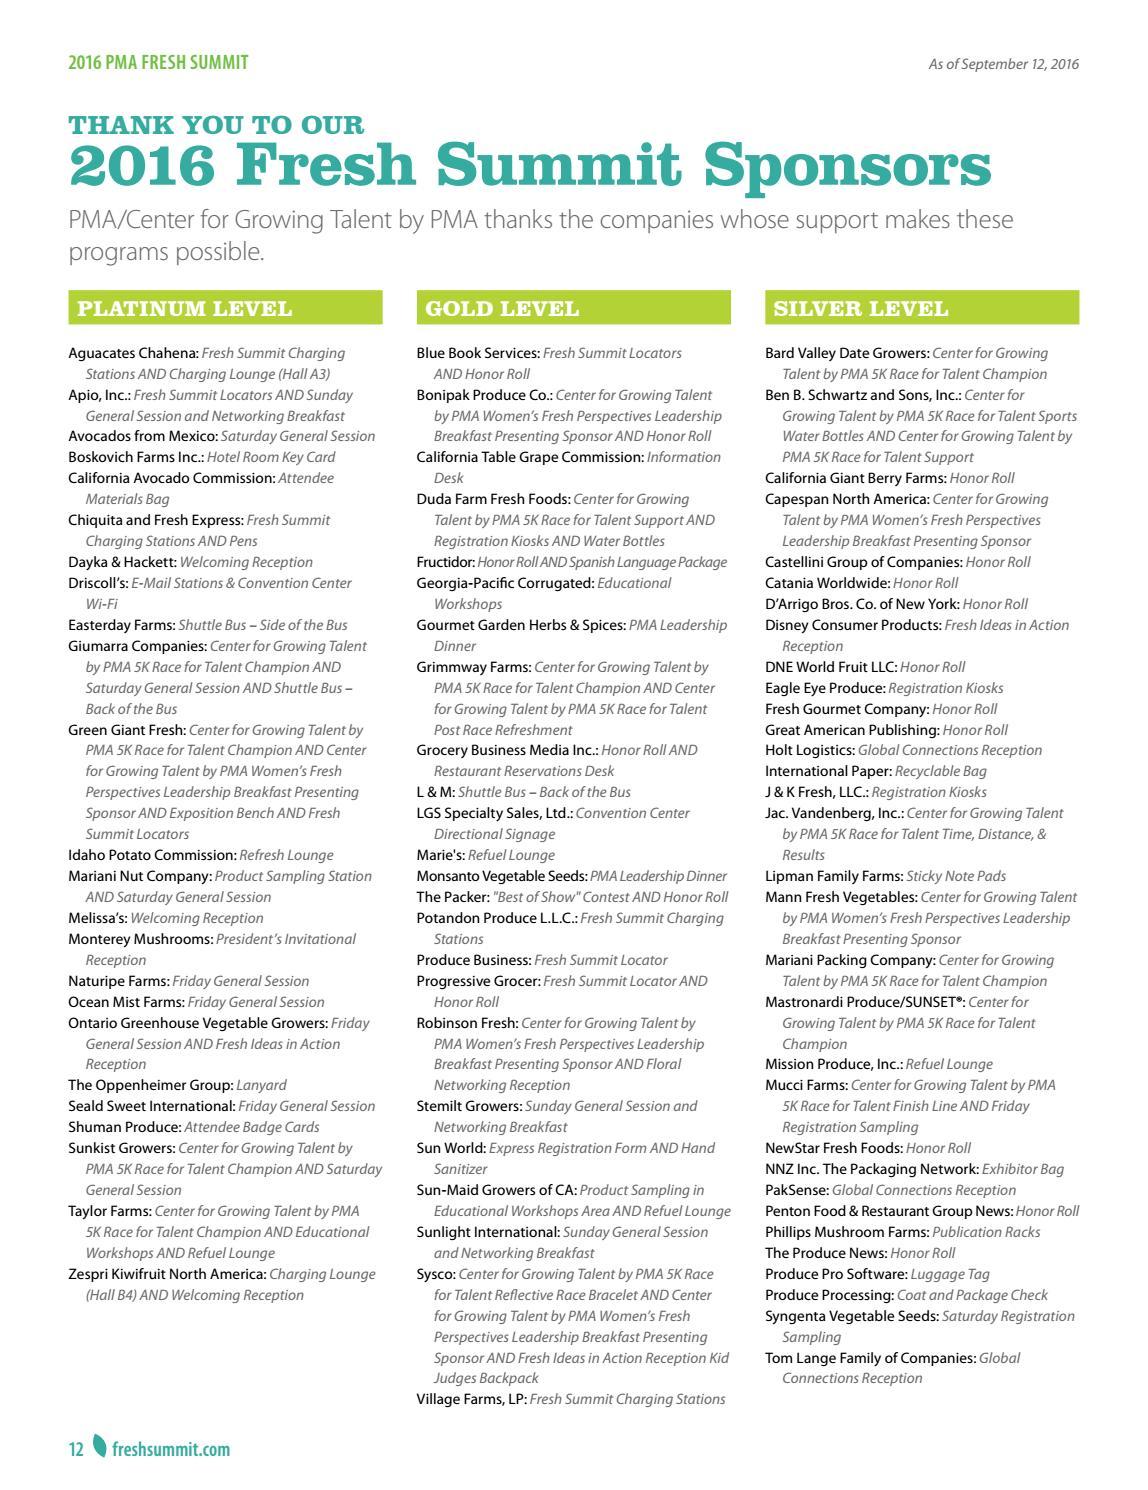 2016 Fresh Summit Directory by Produce Marketing Association